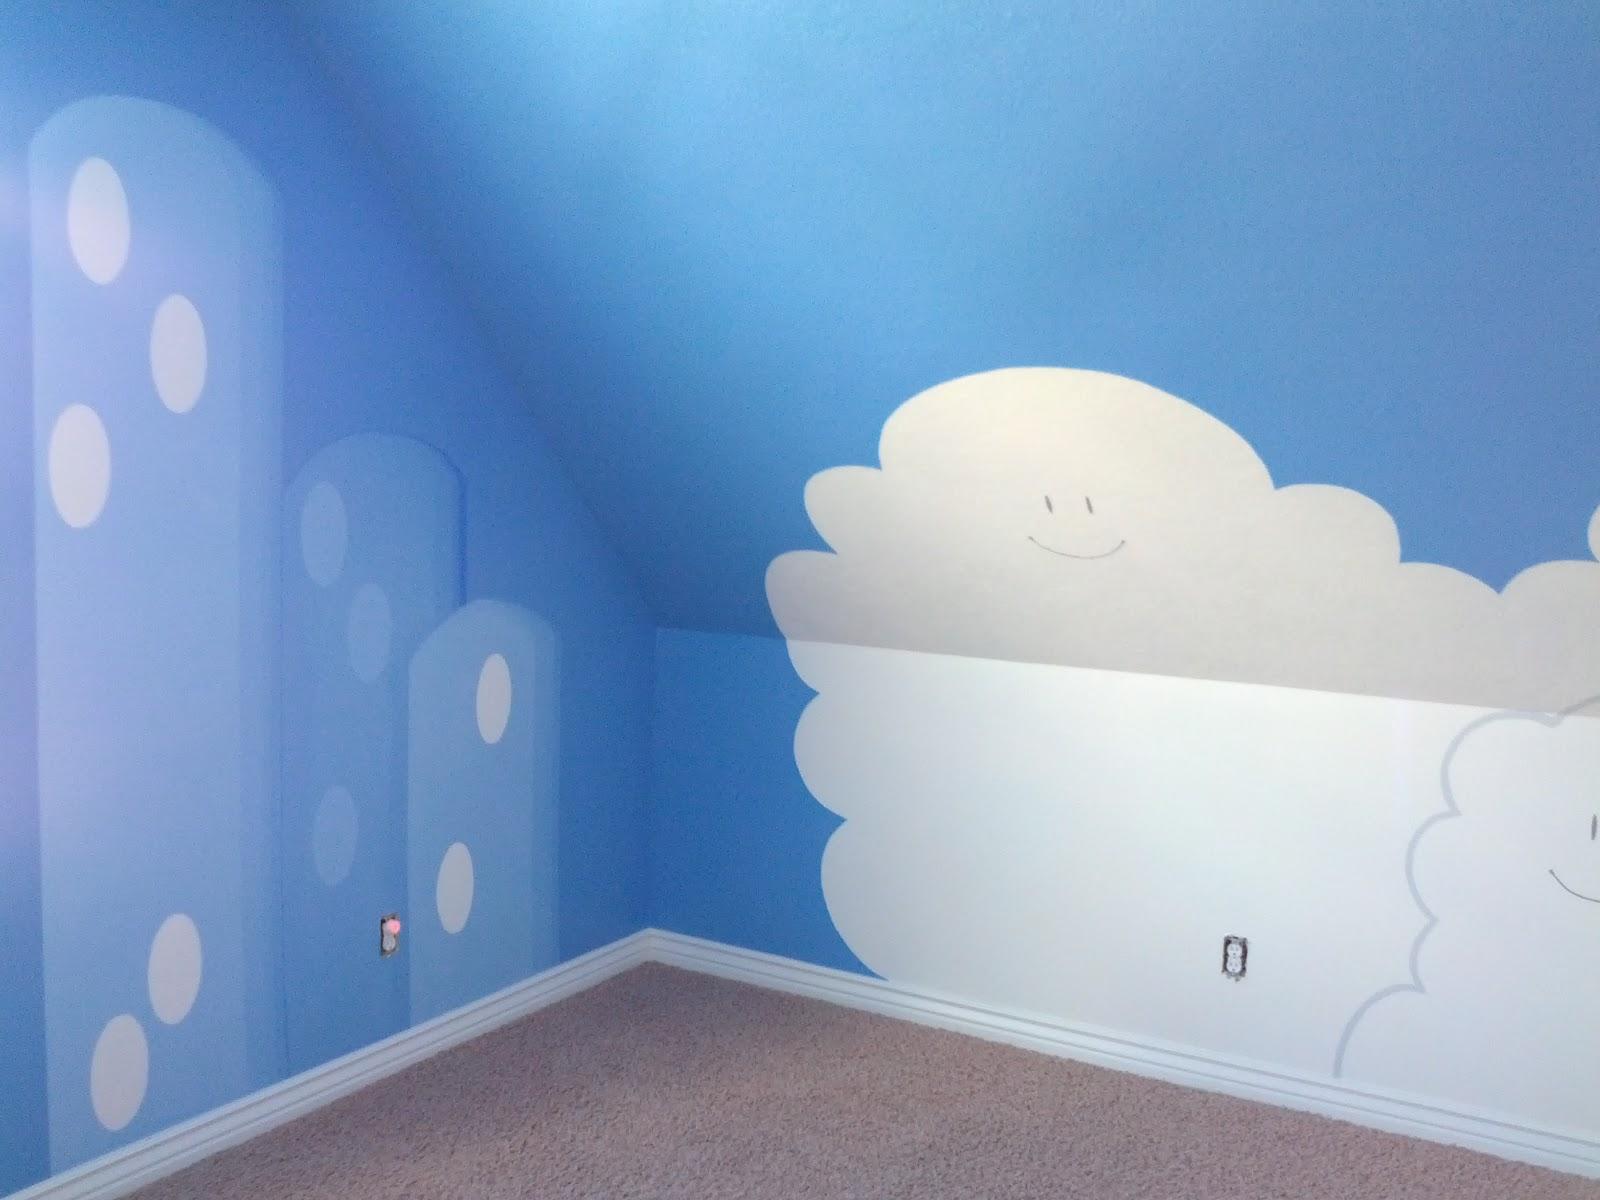 Premature Midlife Crisis Super Mario Brothers Clouds